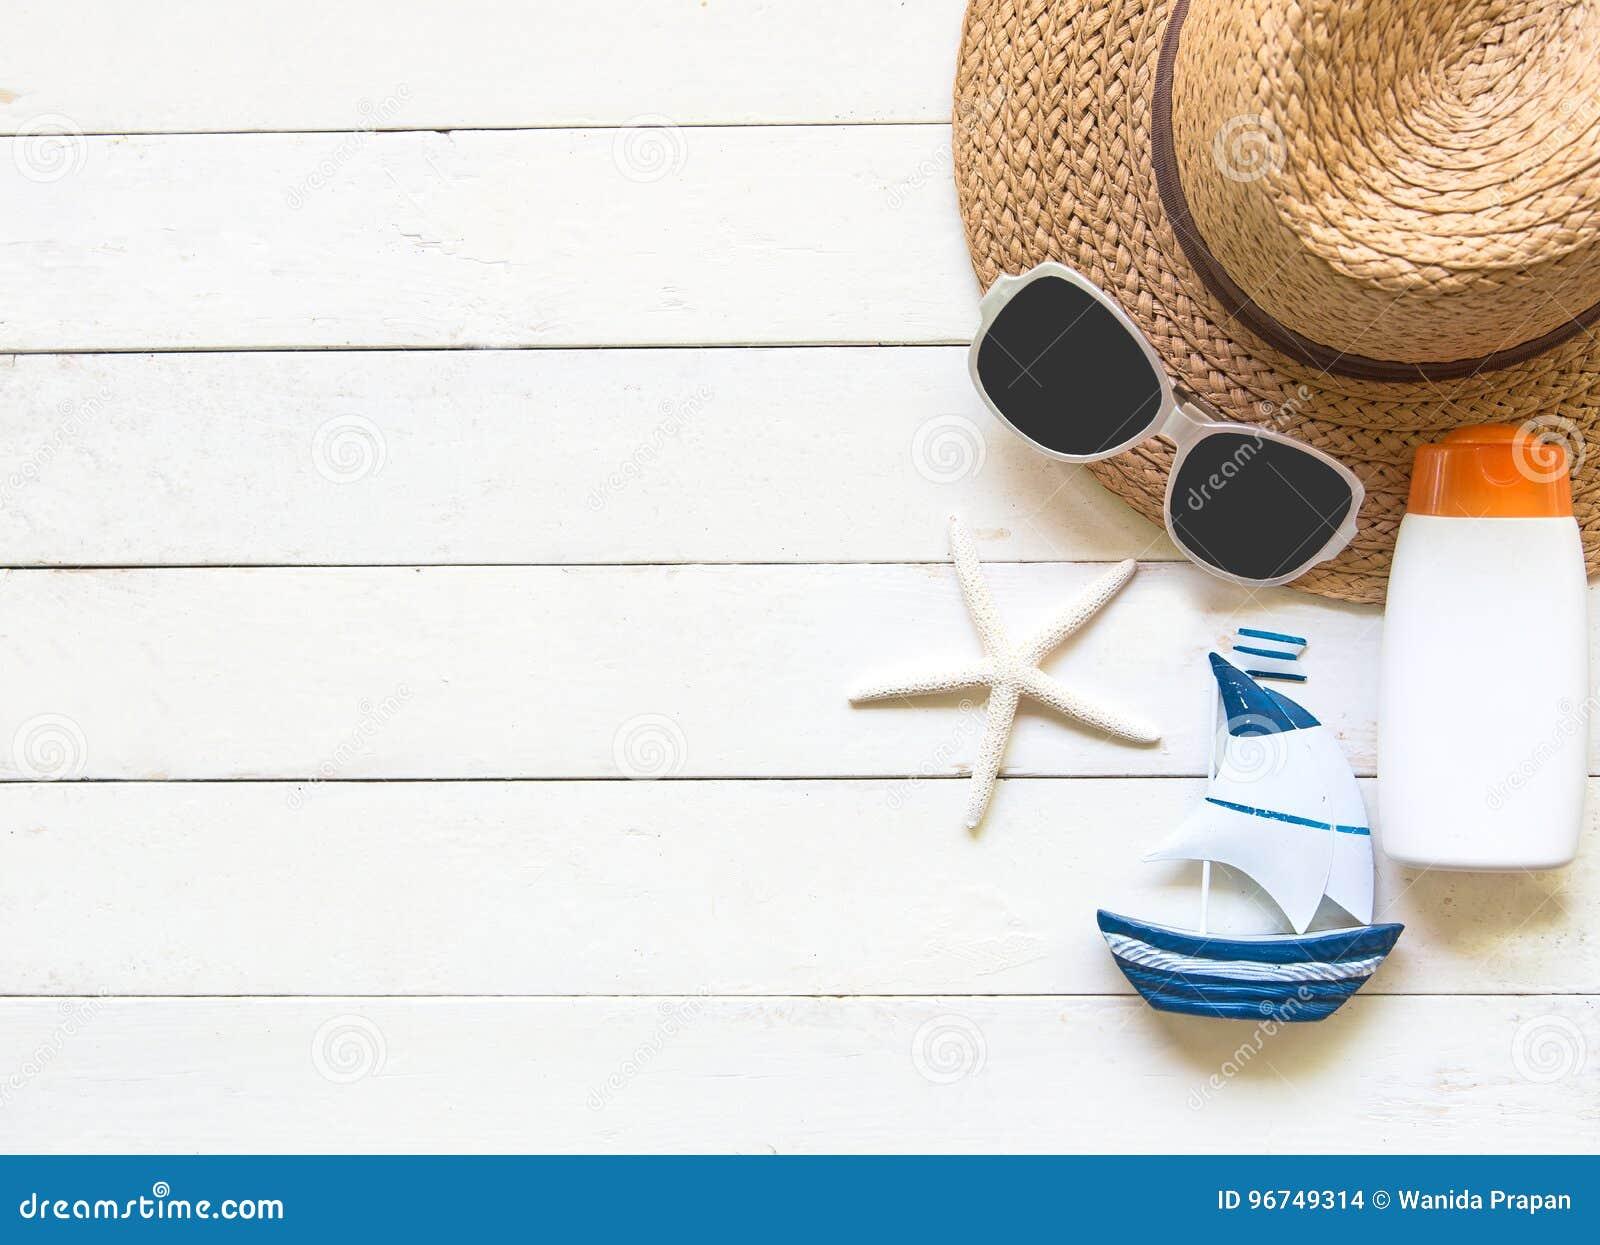 b221ee0c13 Download Μεγάλα καπέλο και εξαρτήματα γυναικών θερινής μόδας στην παραλία  θάλασσα τροπική Ασυνήθιστη τοπ άποψη